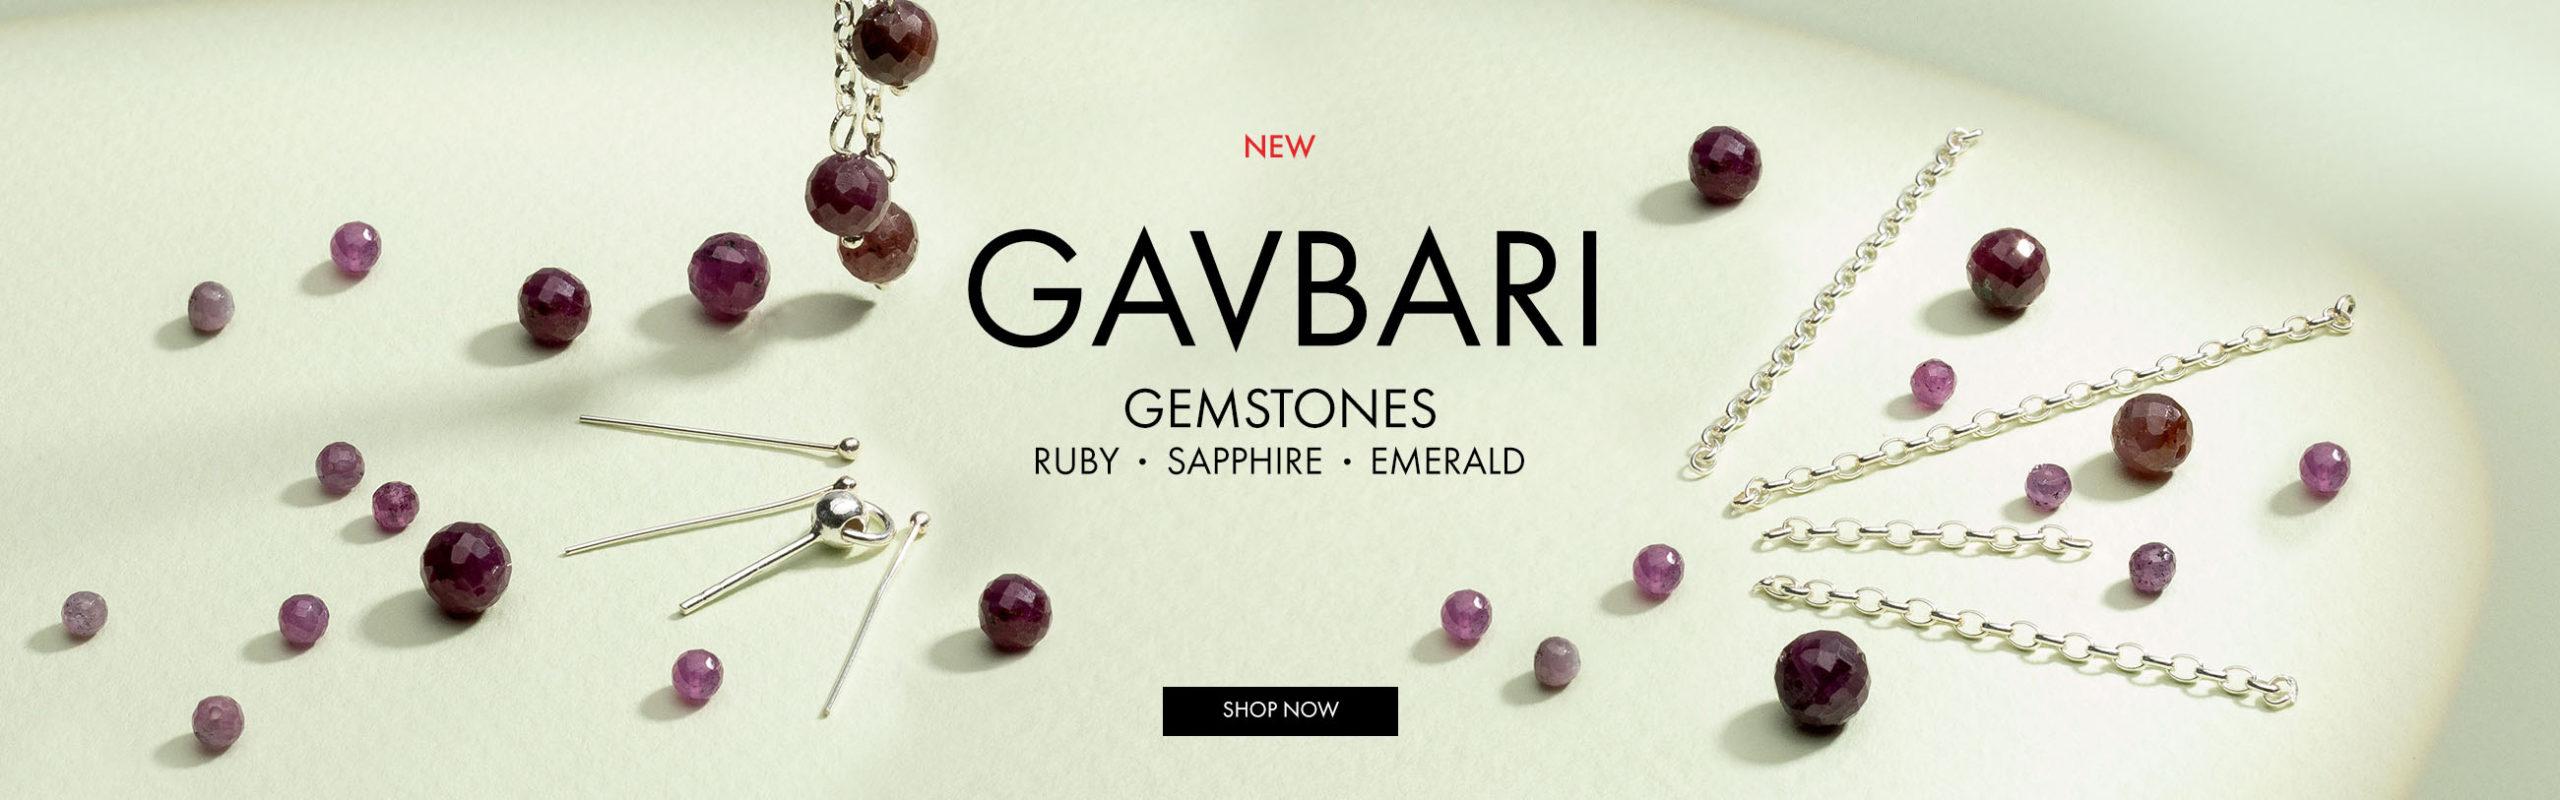 gemstone wholesaler